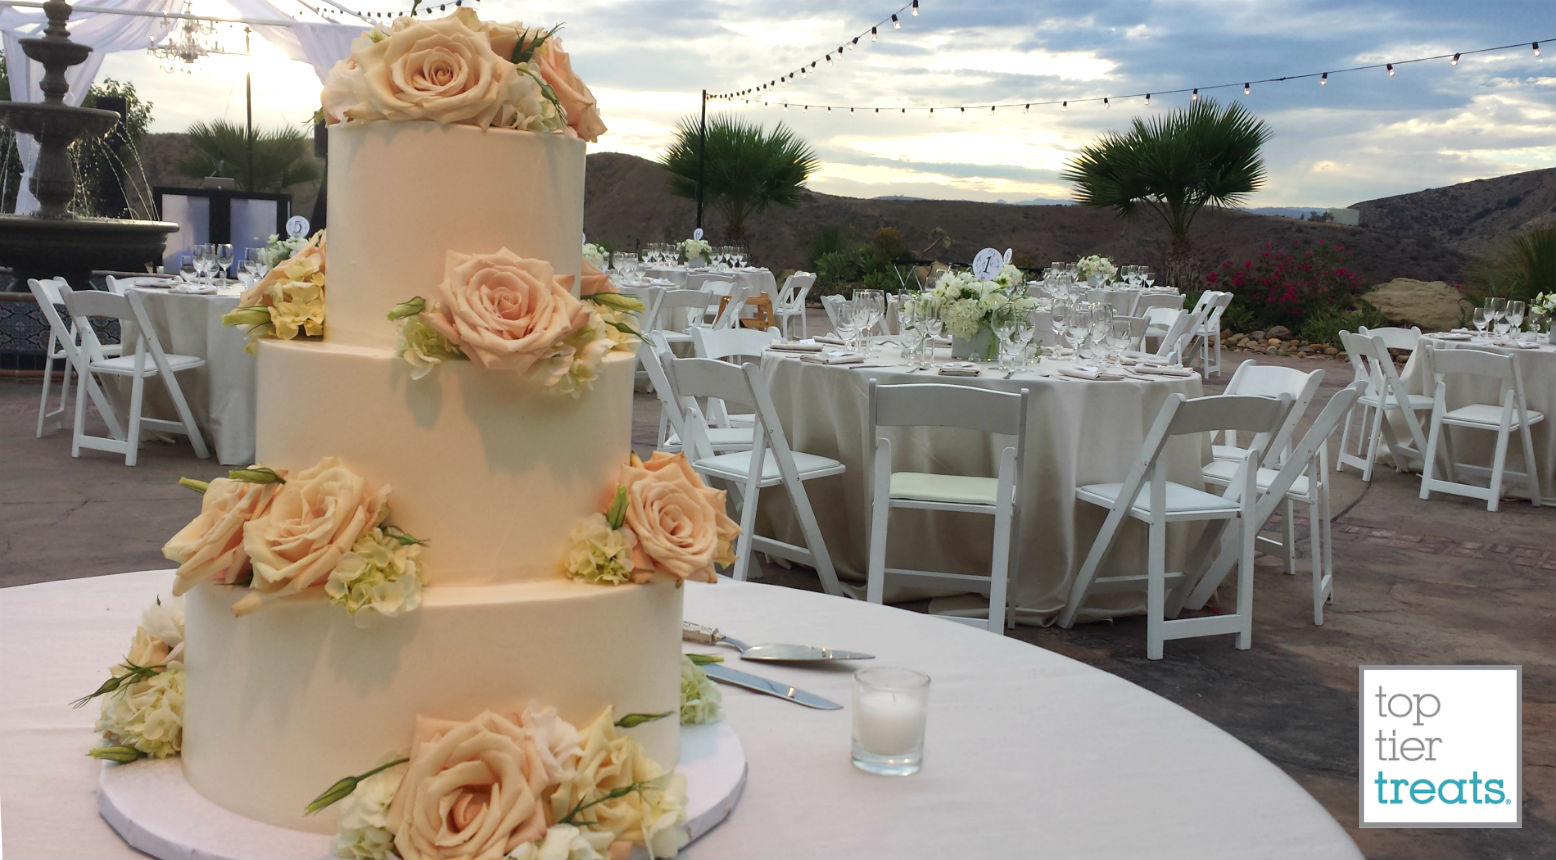 Wedding Cakes – Top Tier Treats